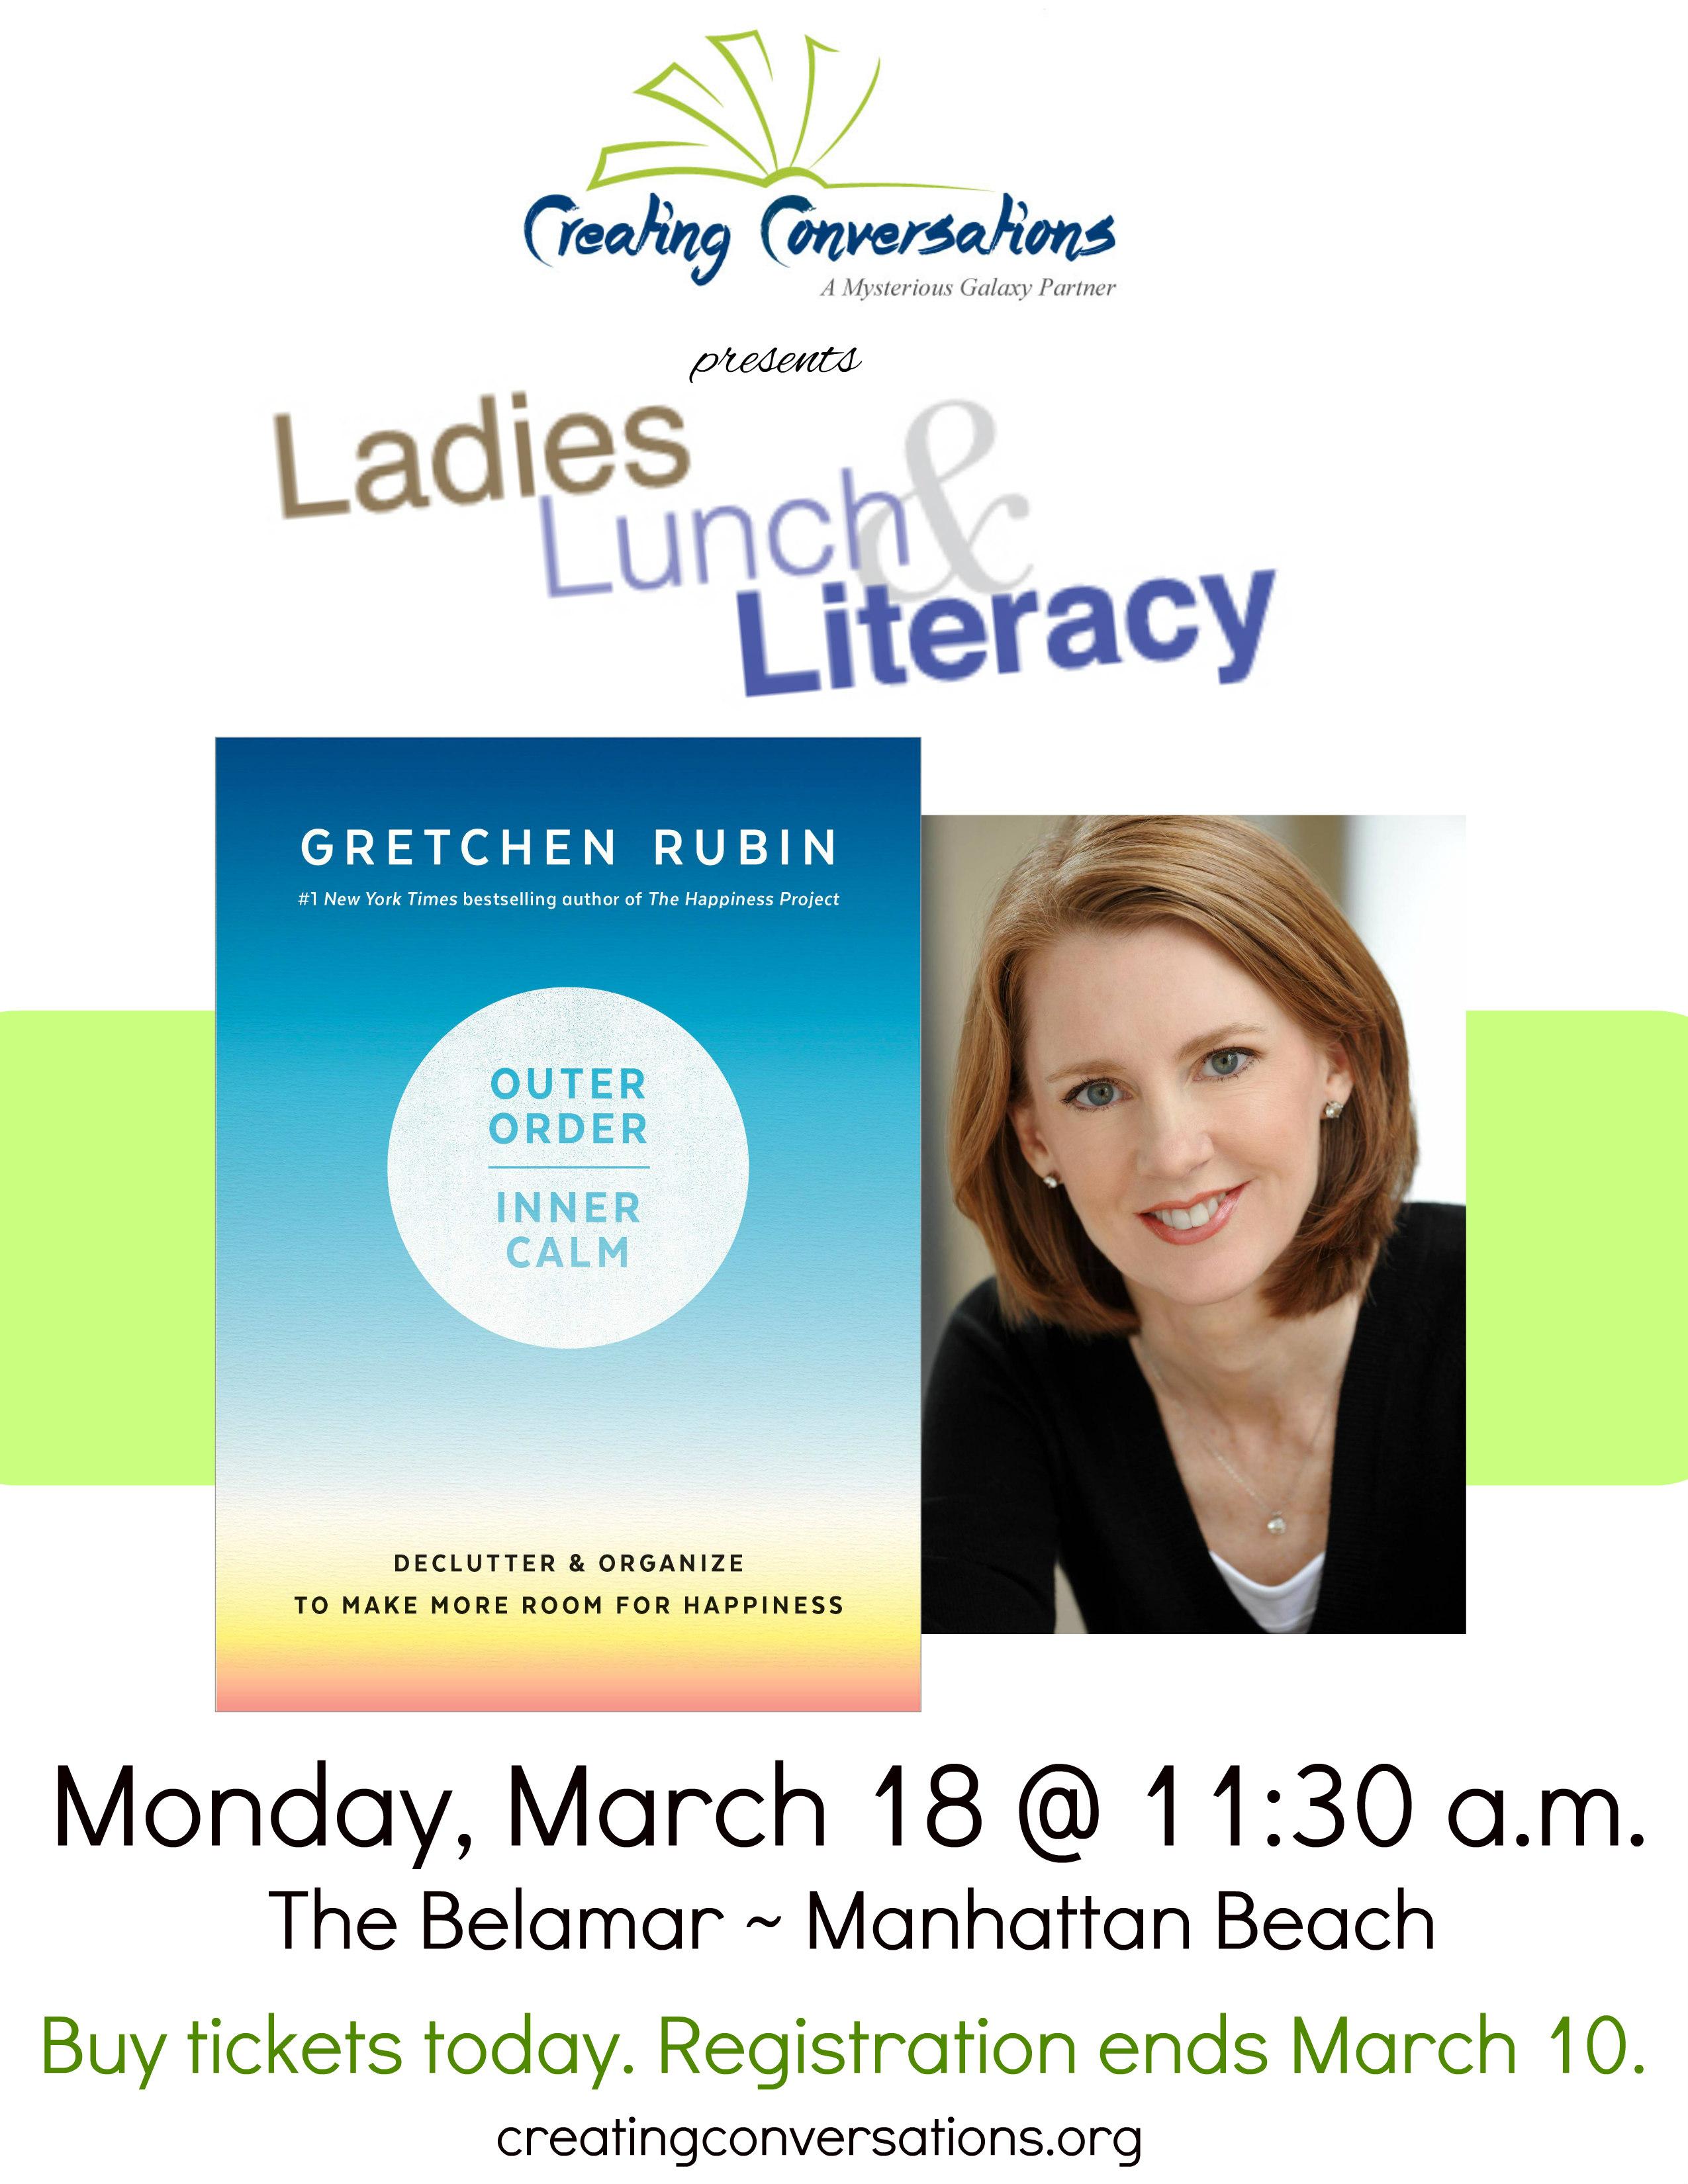 Ladies, Lunch & Literacy Welcomes Gretchen Rubin @ The Belamar Hotel | Manhattan Beach | California | United States